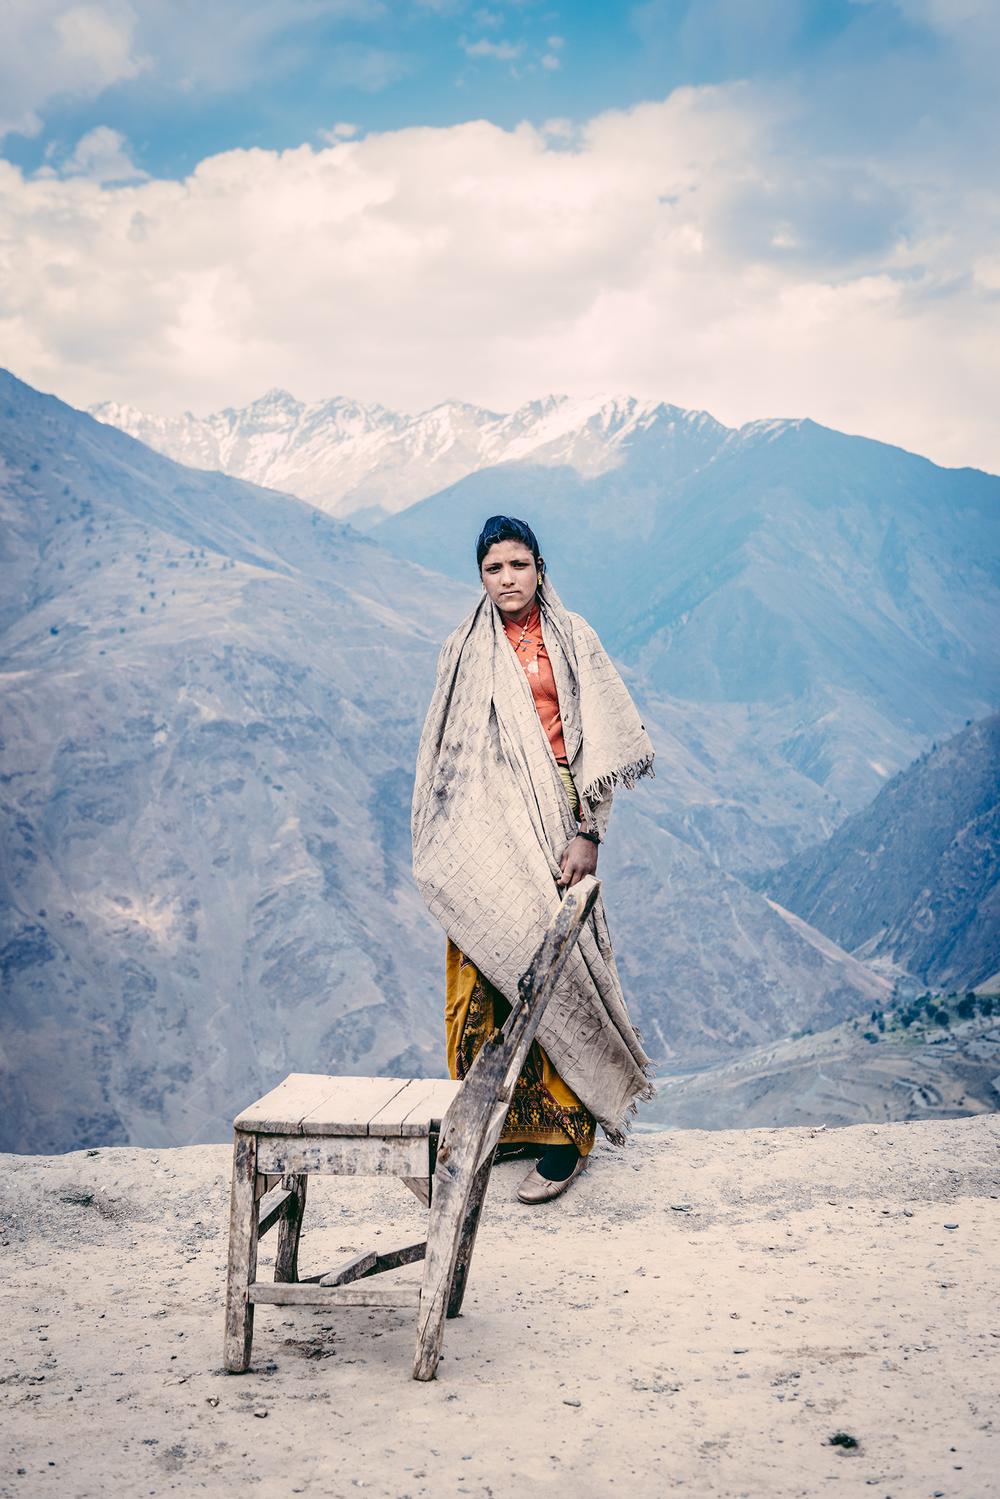 photos from trekking in Dolpo region in Nepal